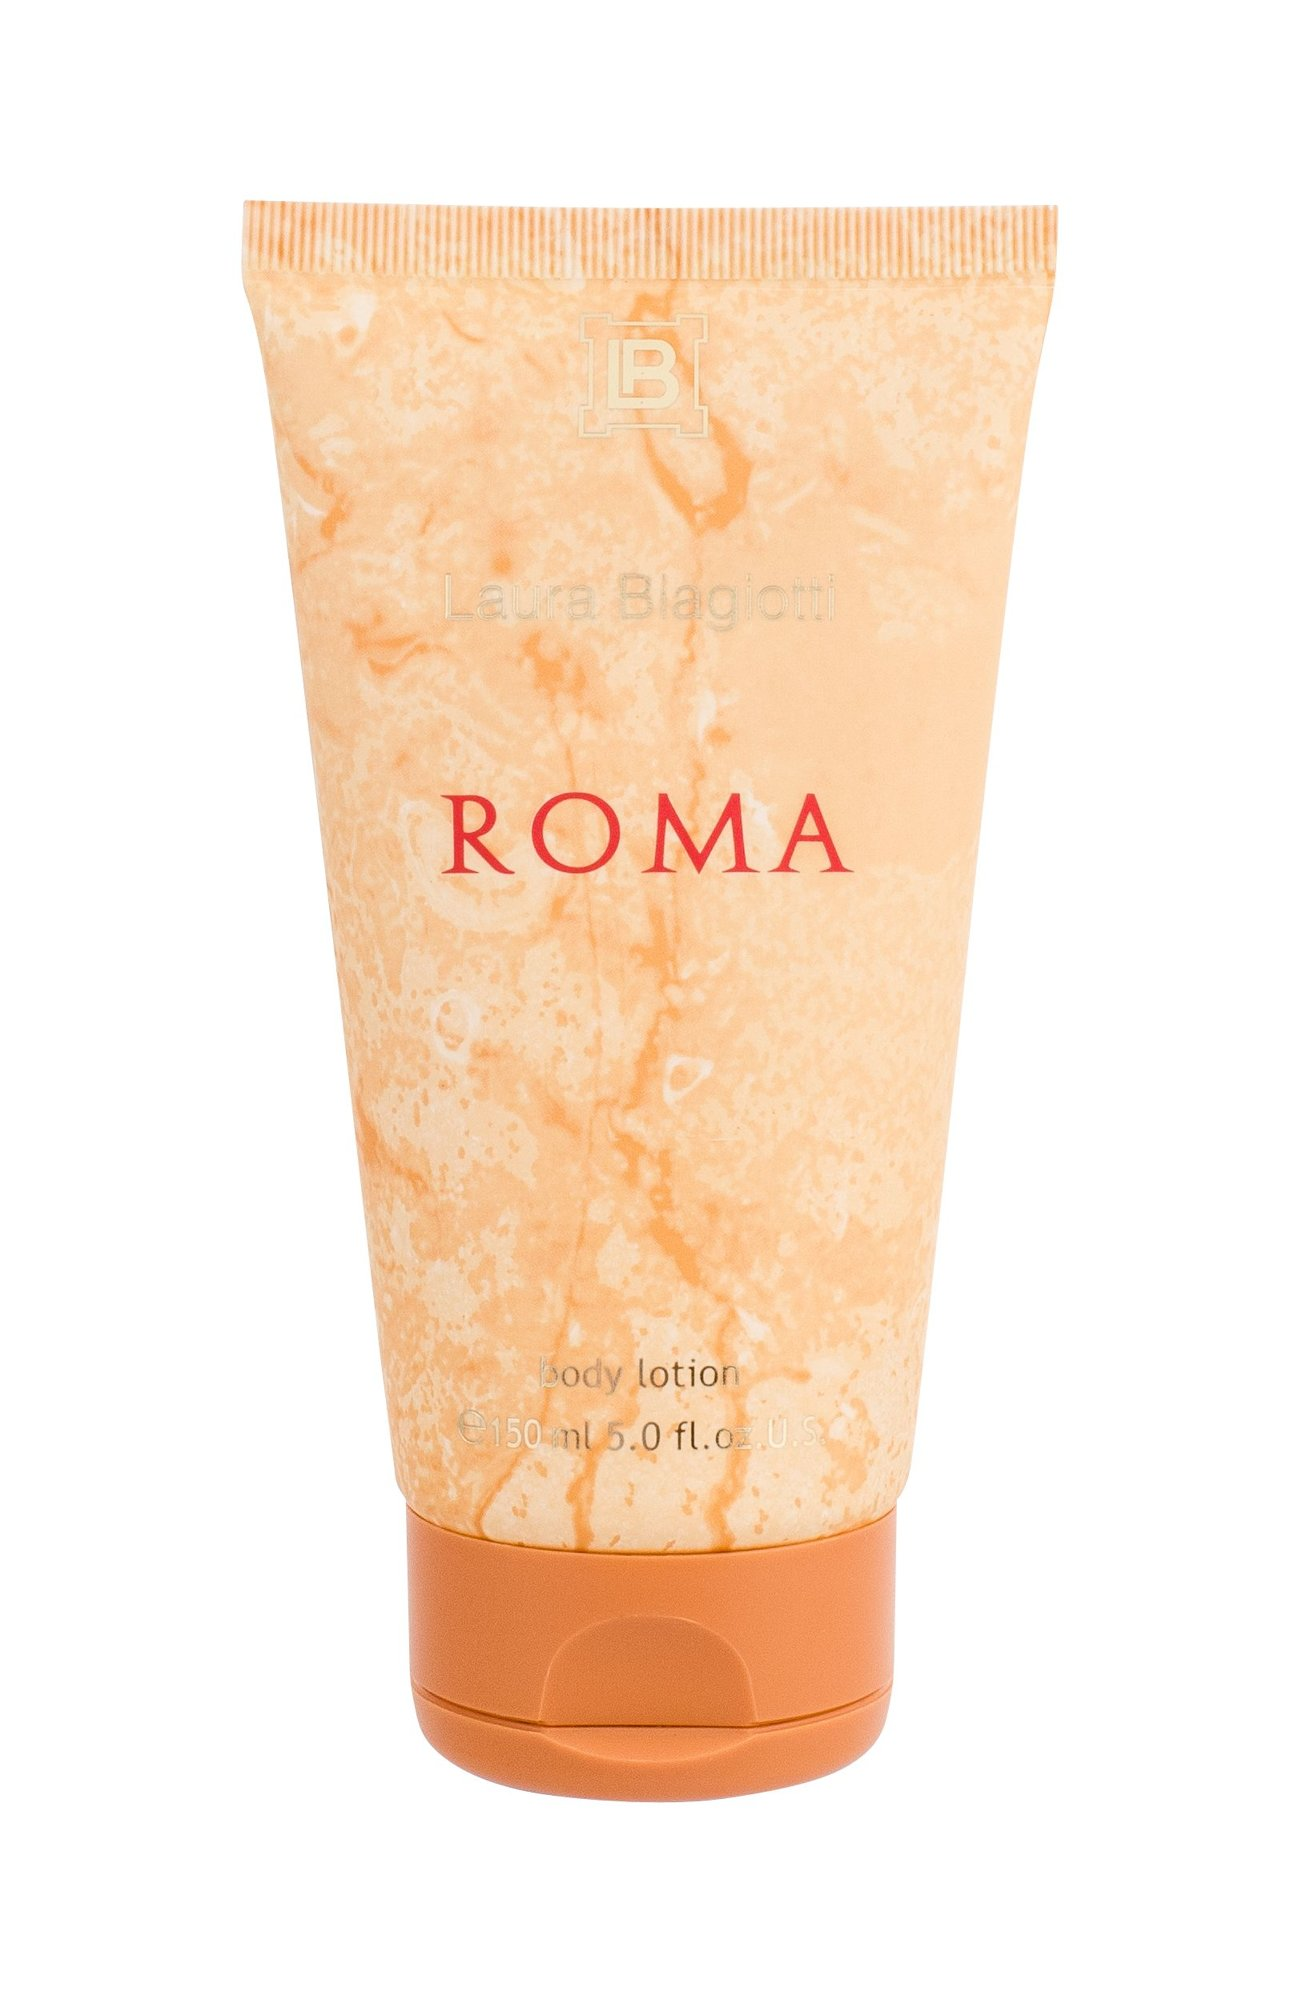 Laura Biagiotti Roma Body lotion 150ml